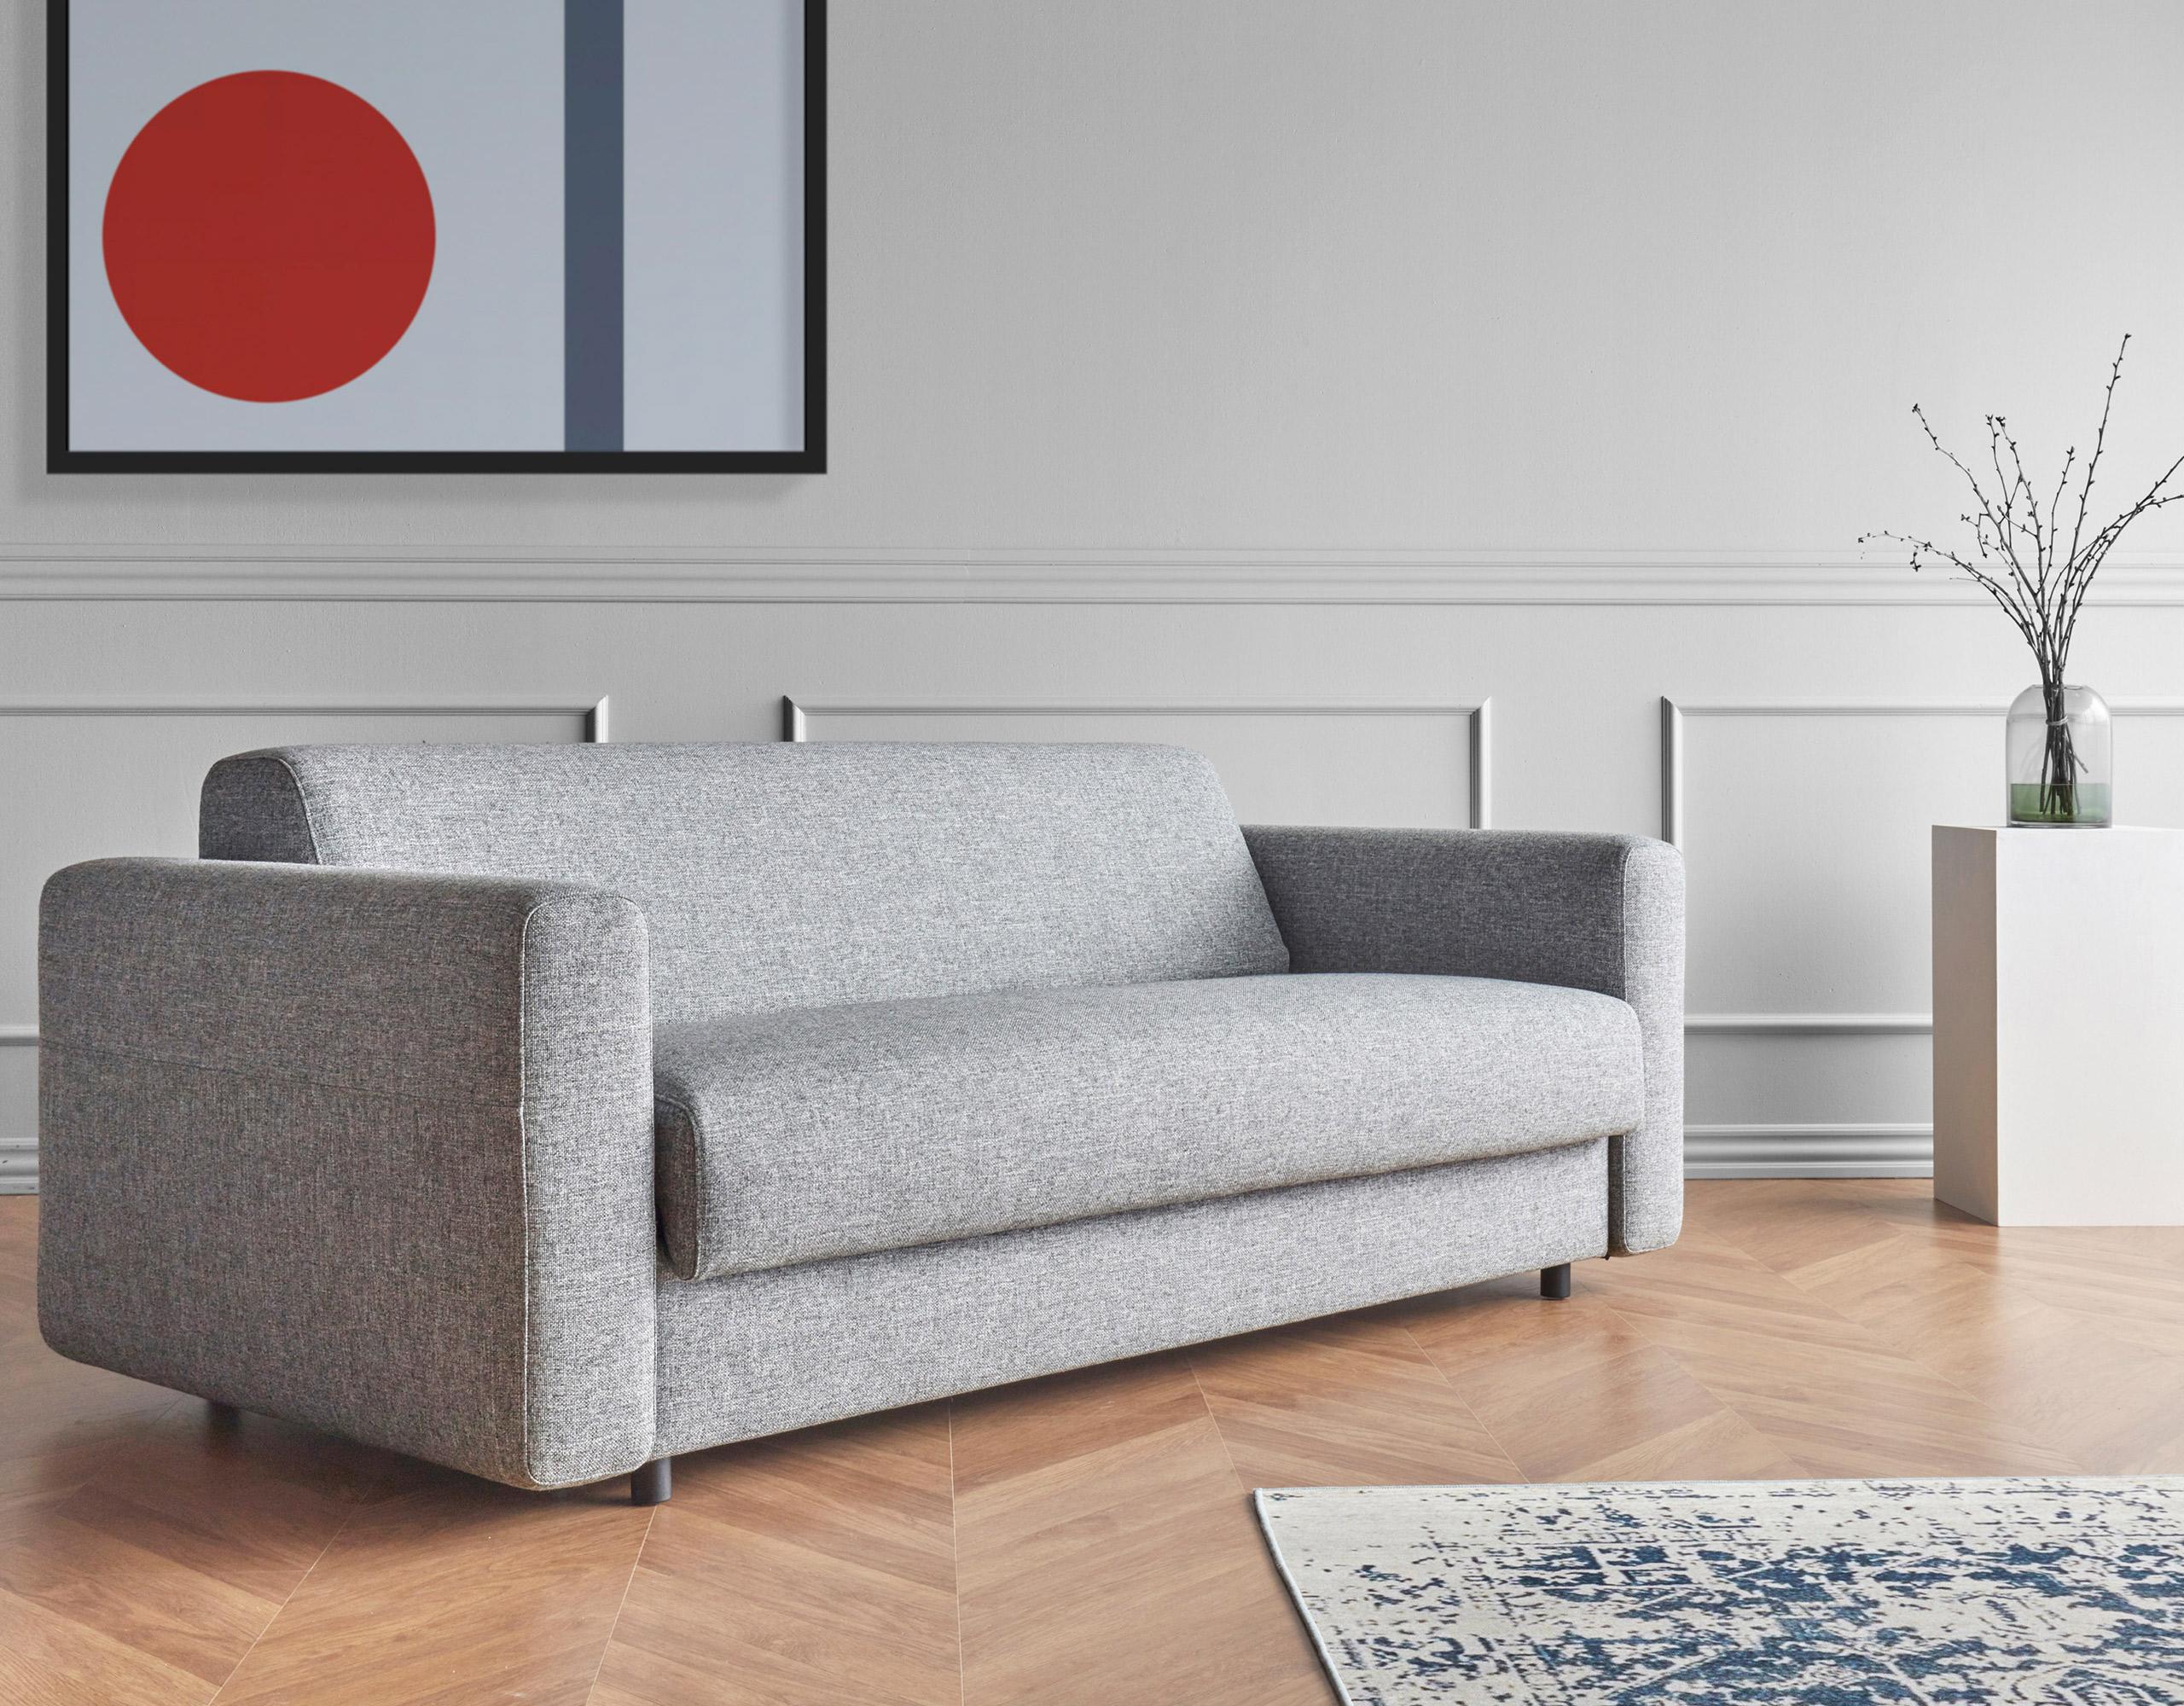 Killian 160 King Size Sofa Bed